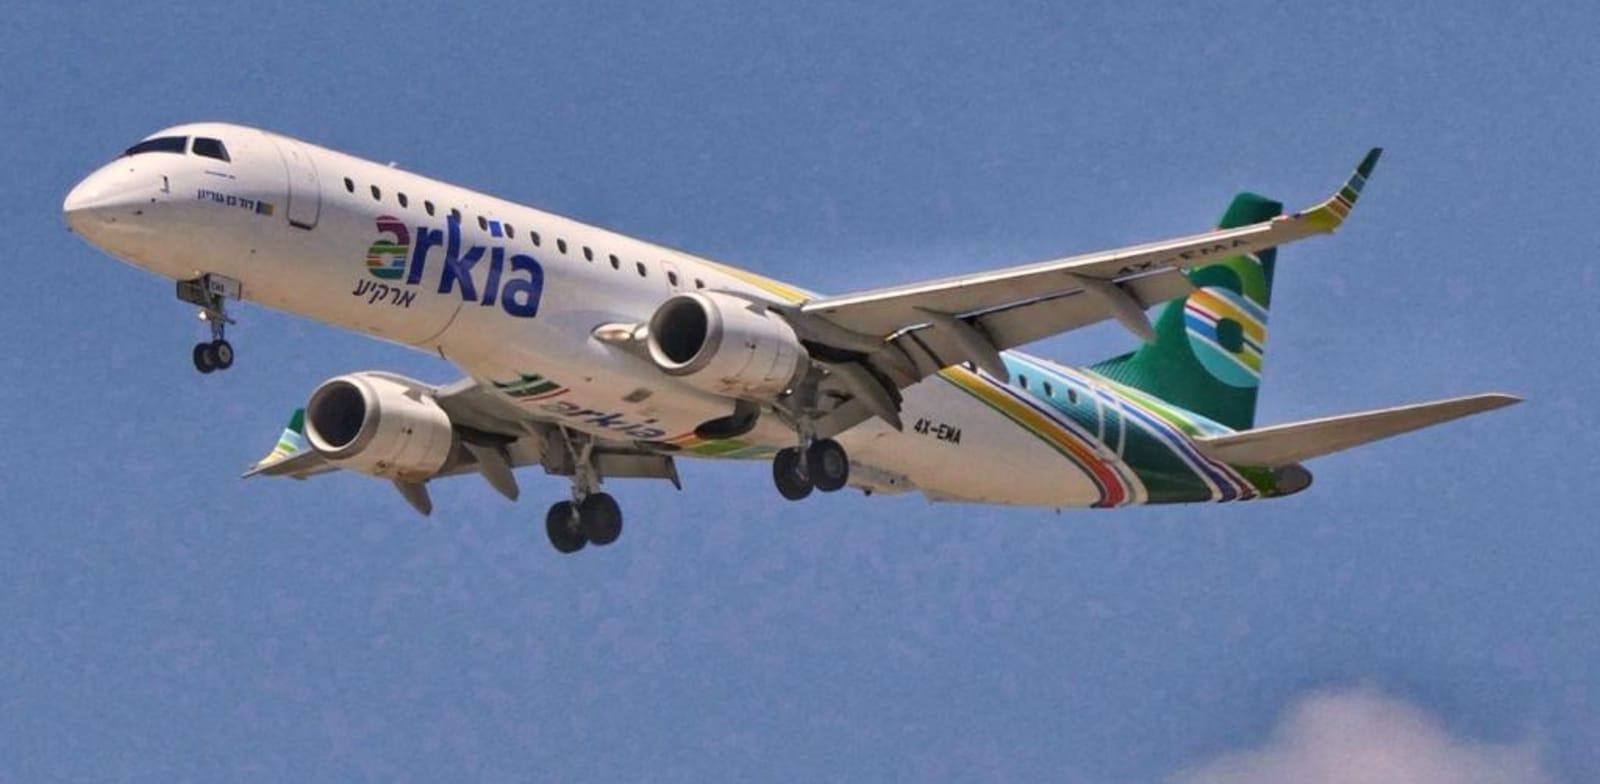 מטוס ארקיע / צילום: דני שדה